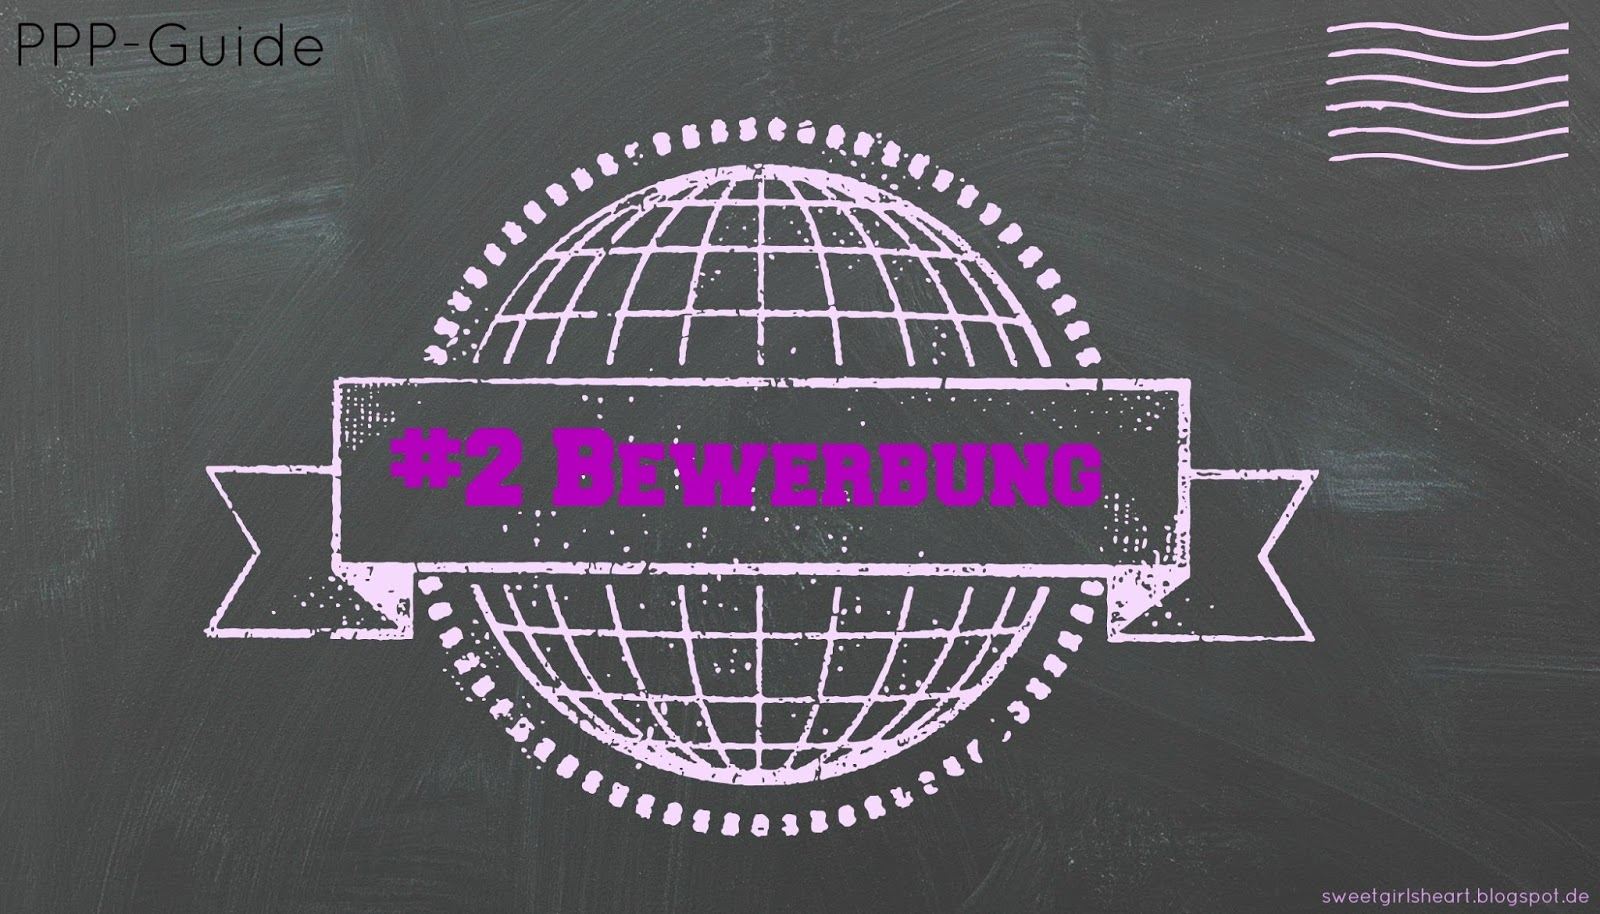 PPP Guide #2 Bewerbungsunterlagen | Sweetgirlsheart